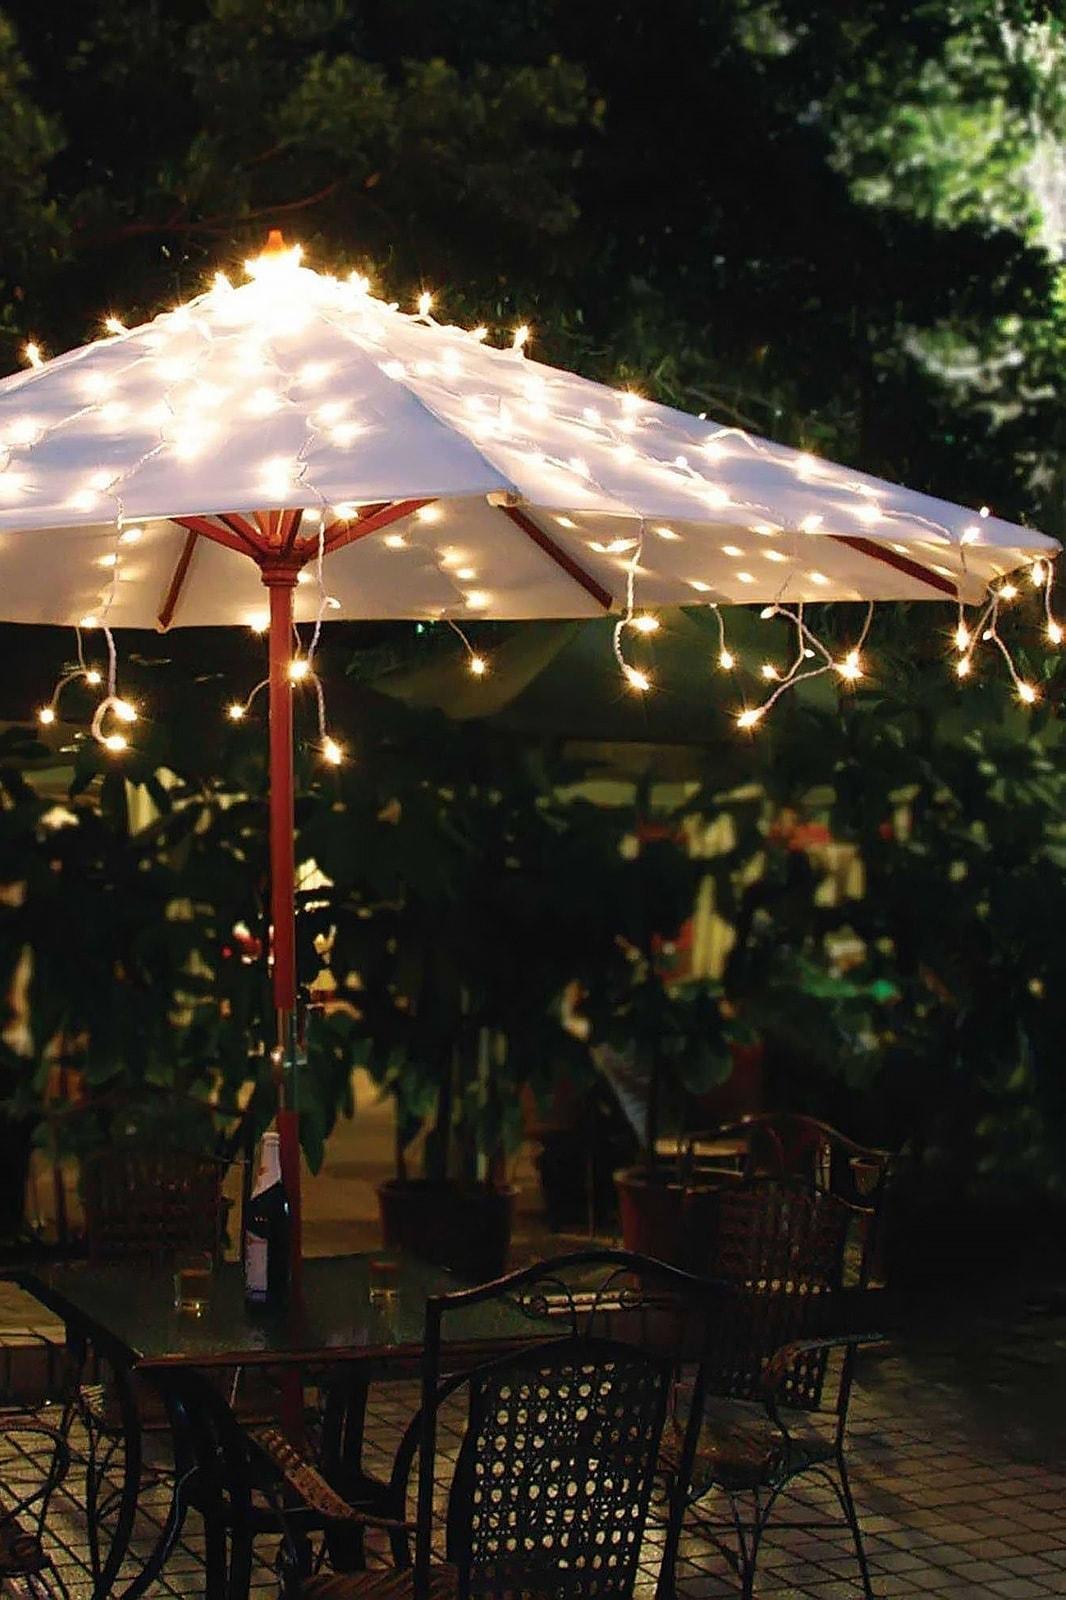 kerstverlichting parasol